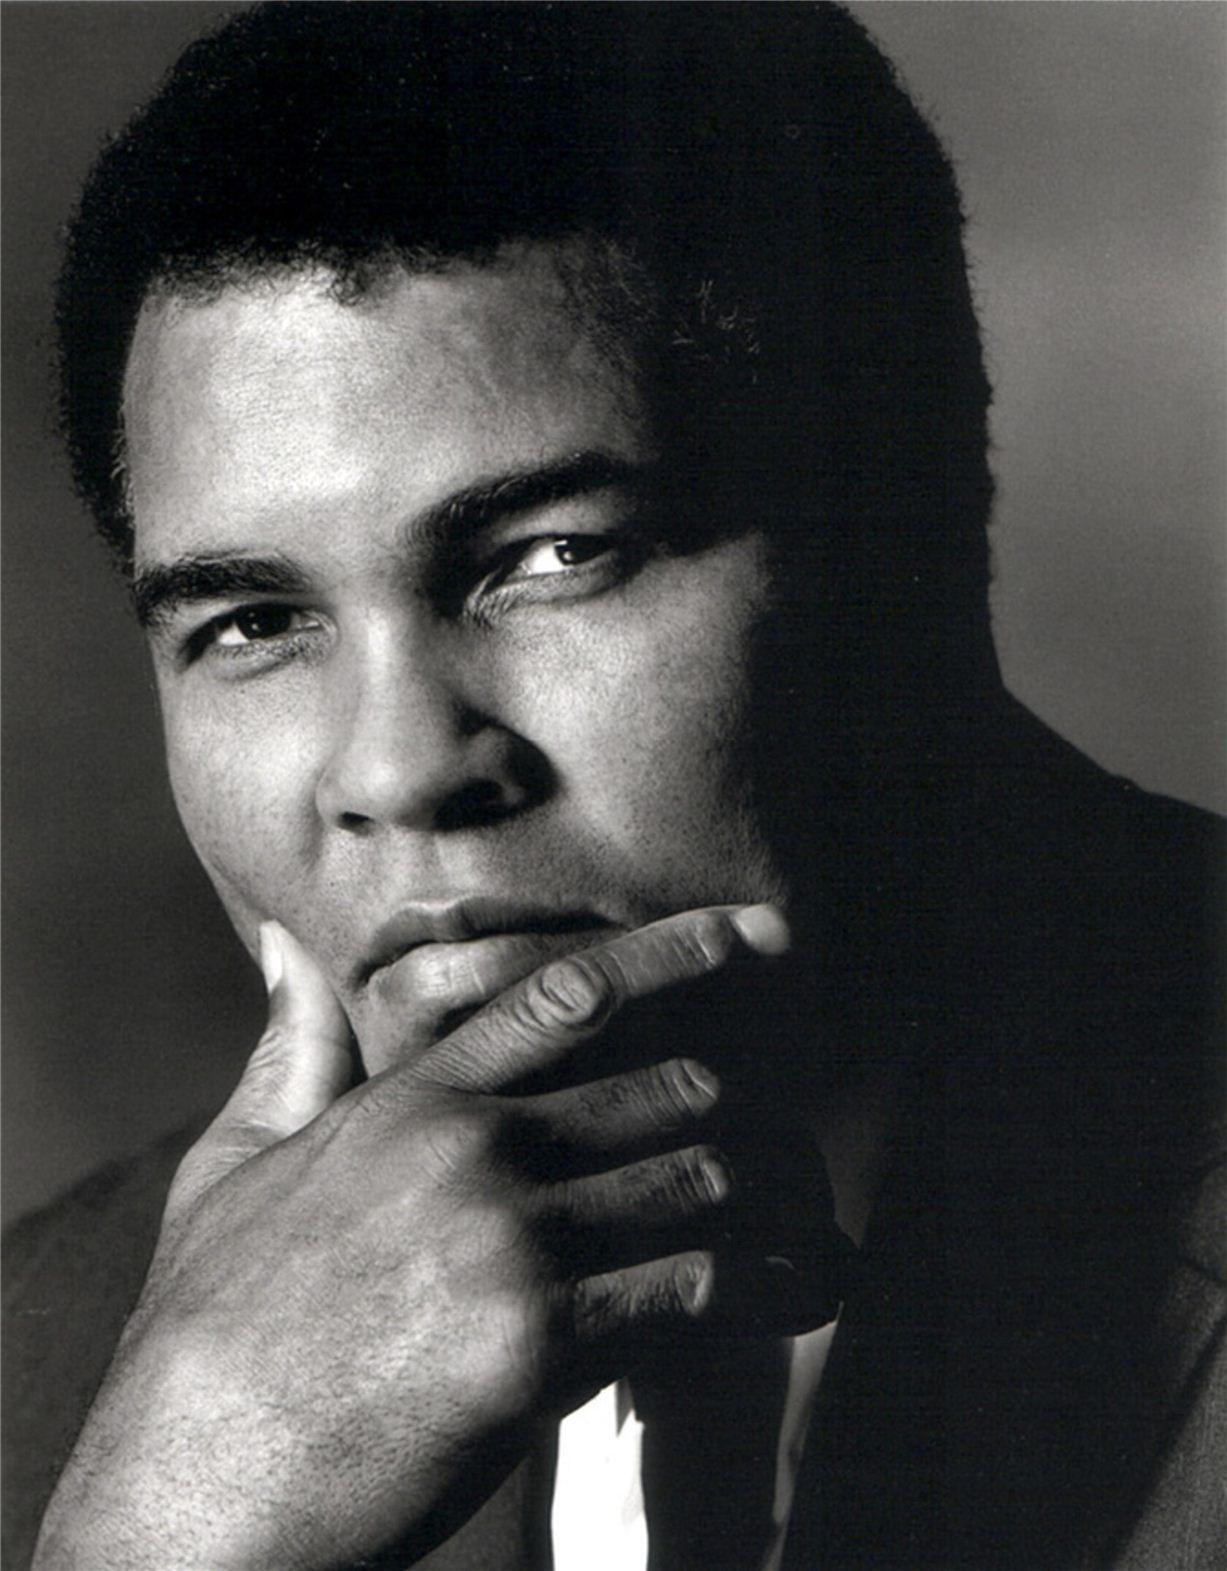 Muhammad Ali / Мохаммед Али - портрет фотографа Грега Гормана / Greg Gorman